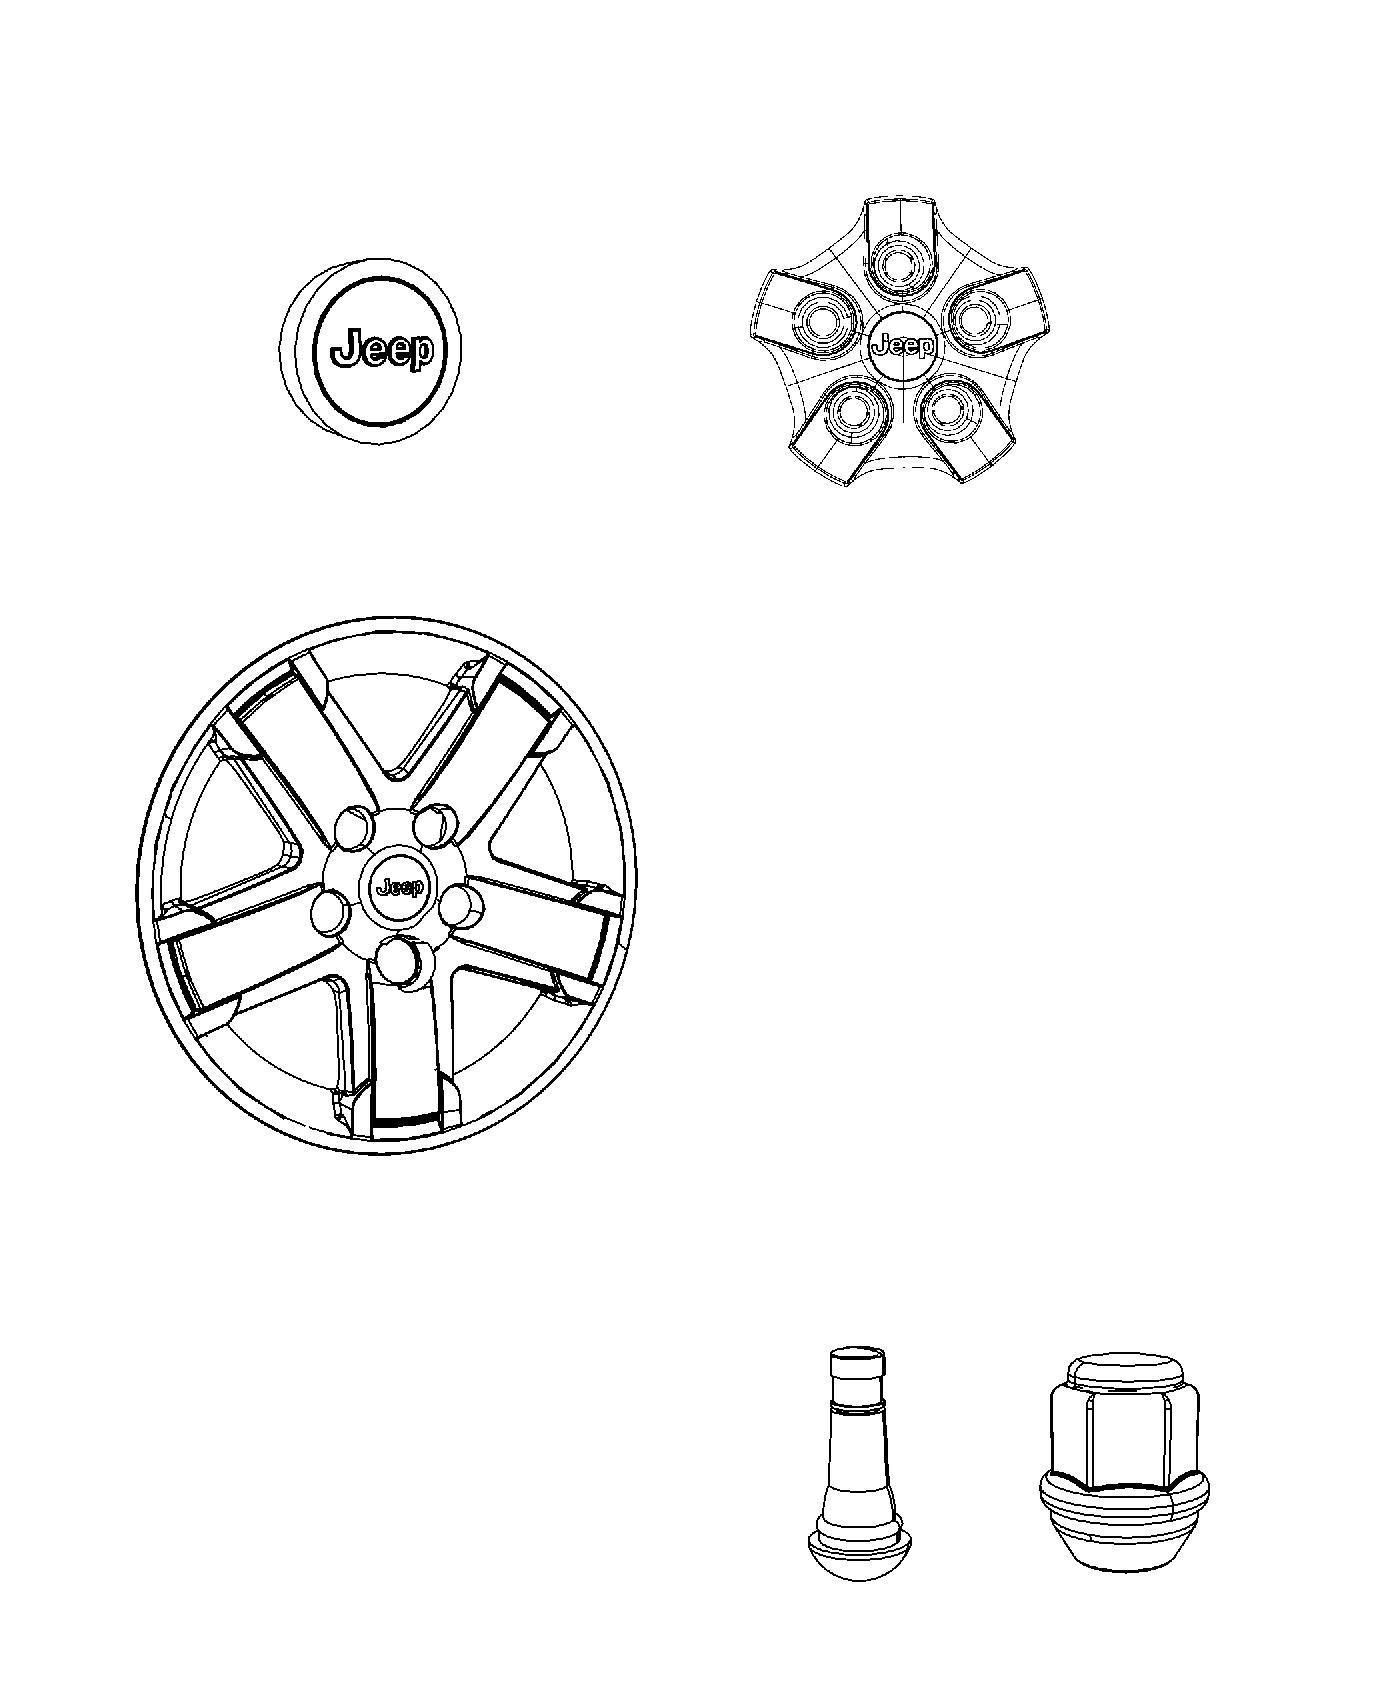 2014 jeep compass cap  wheel center   wf9  or  wrg    wfp  or  wp5    whg  or  wfg    wrg